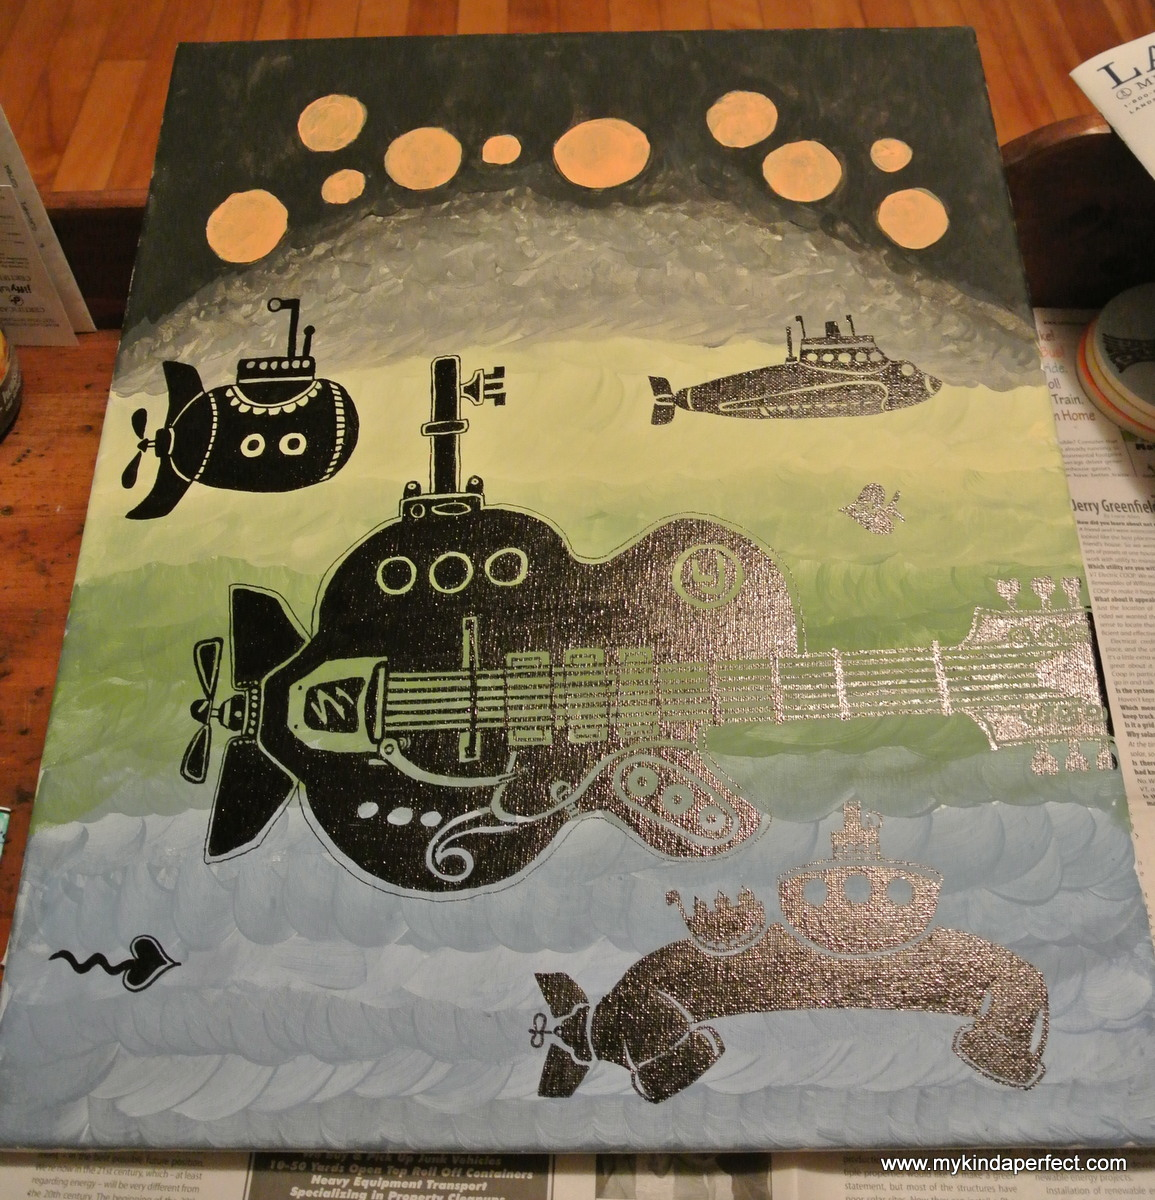 my kinda perfect: art inspired by music